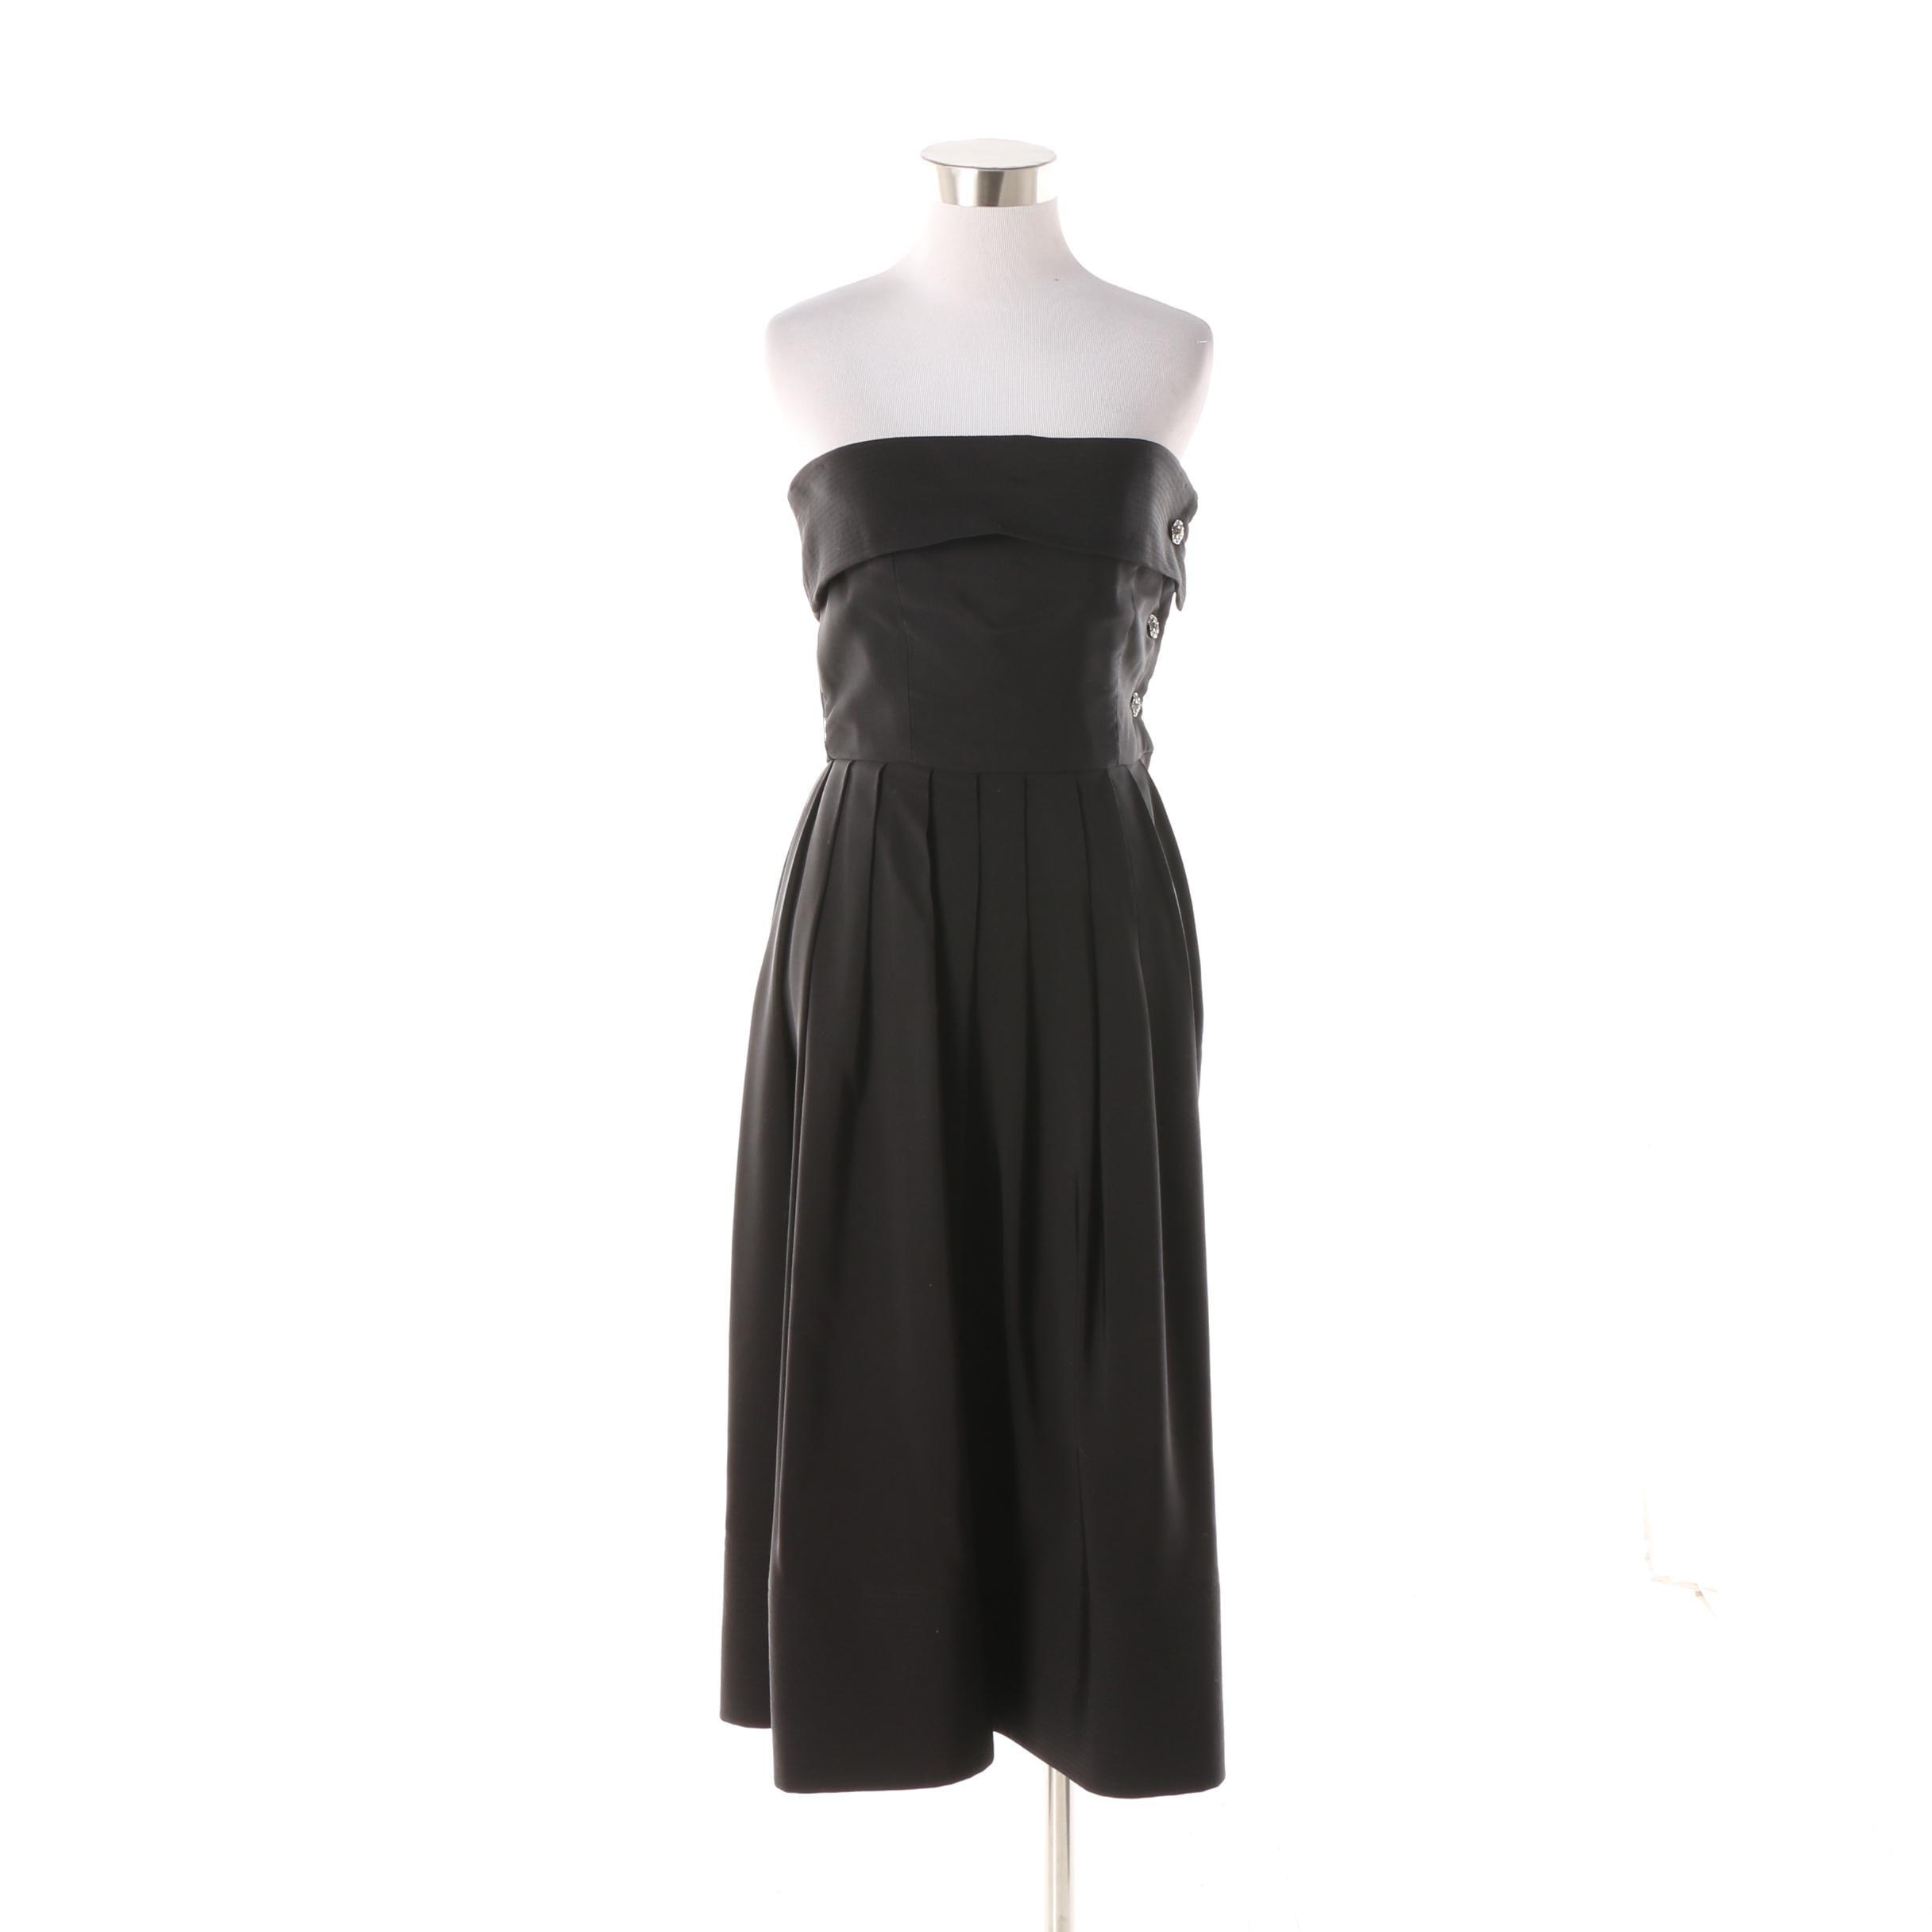 Circa 1980s Vintage Morton Myles for the Warrens Black Strapless Cocktail Dress